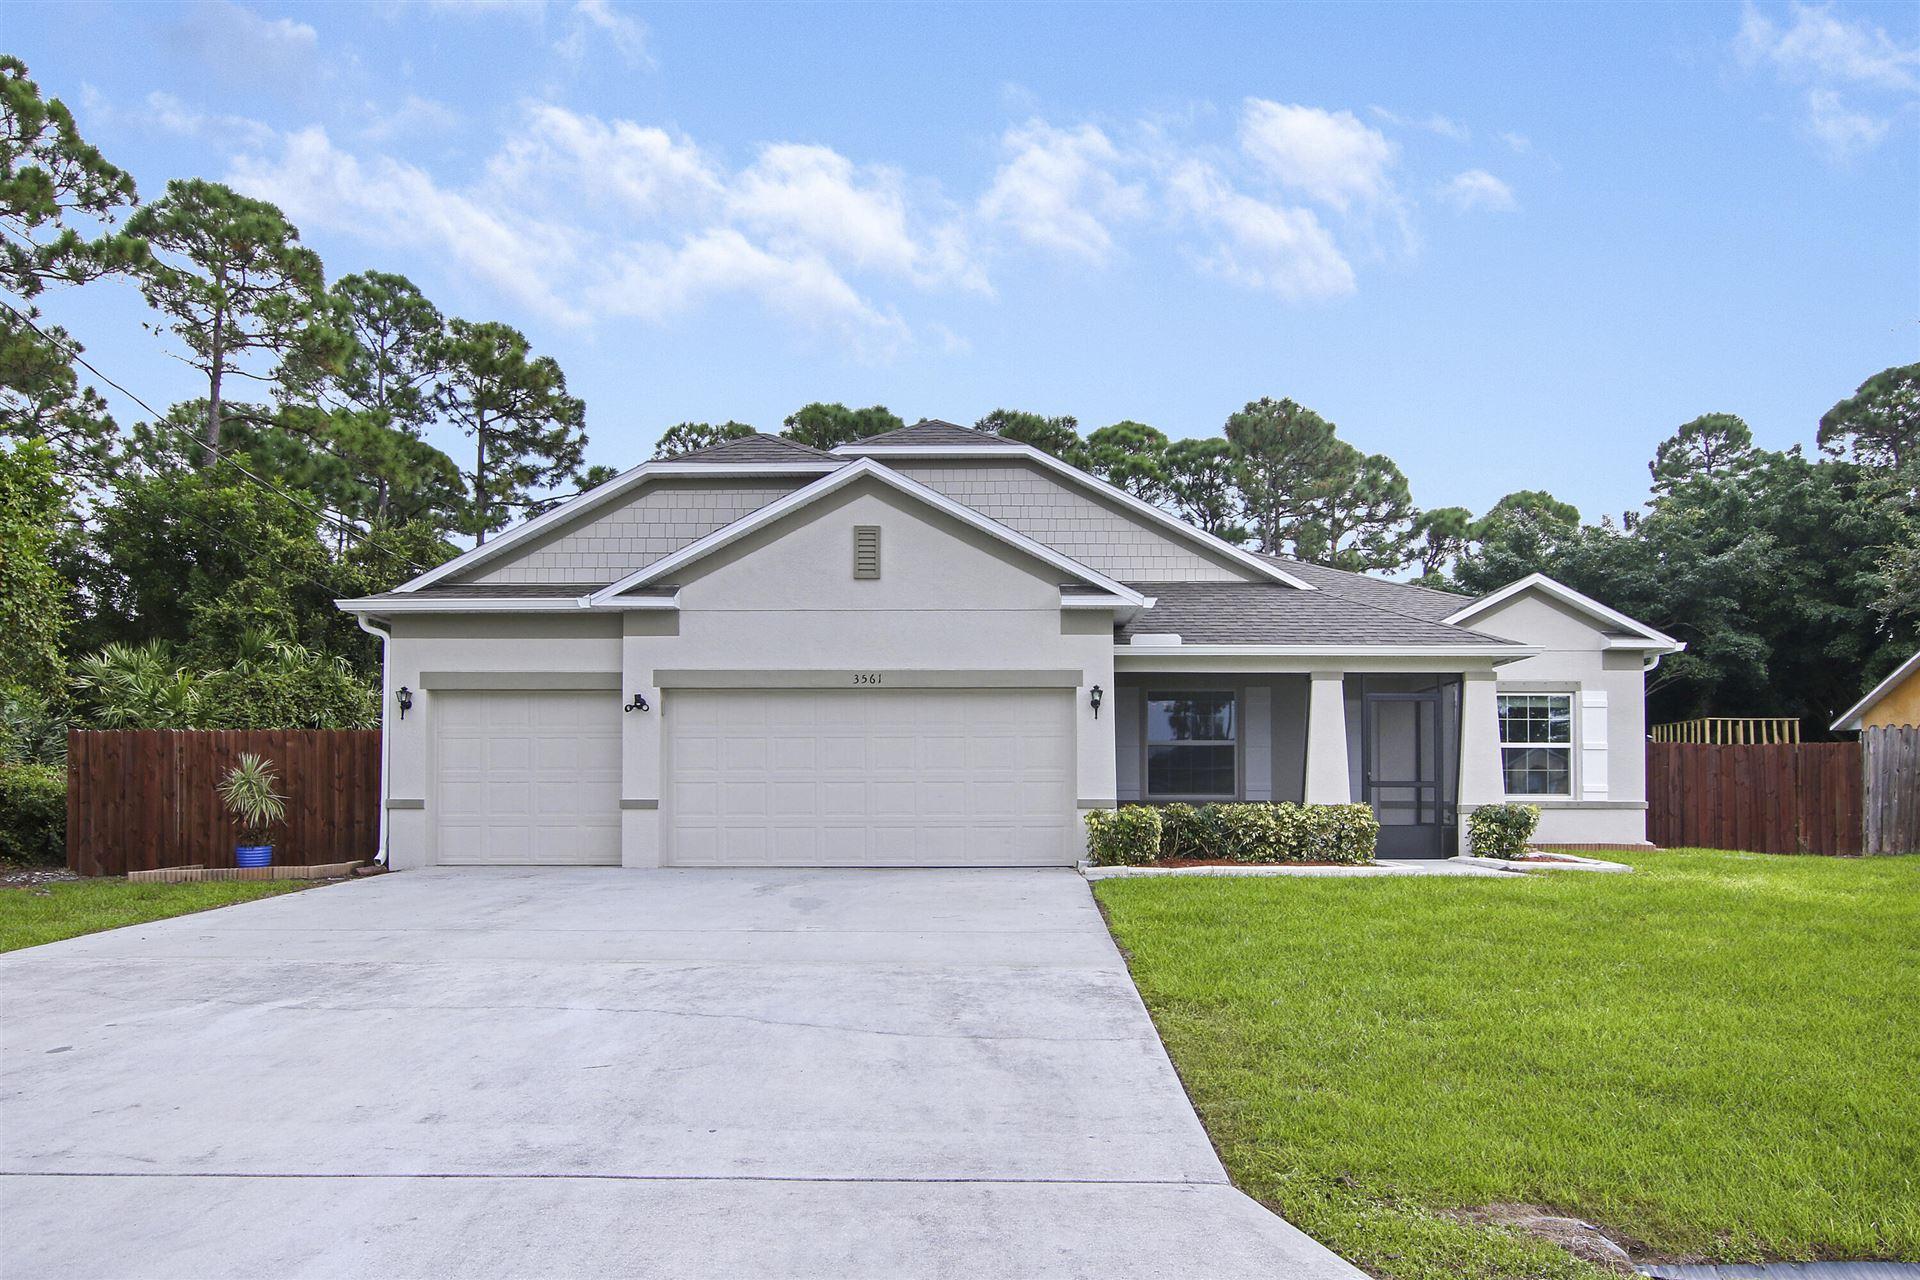 3561 SW Europe Street, Port Saint Lucie, FL 34953 - MLS#: RX-10750744